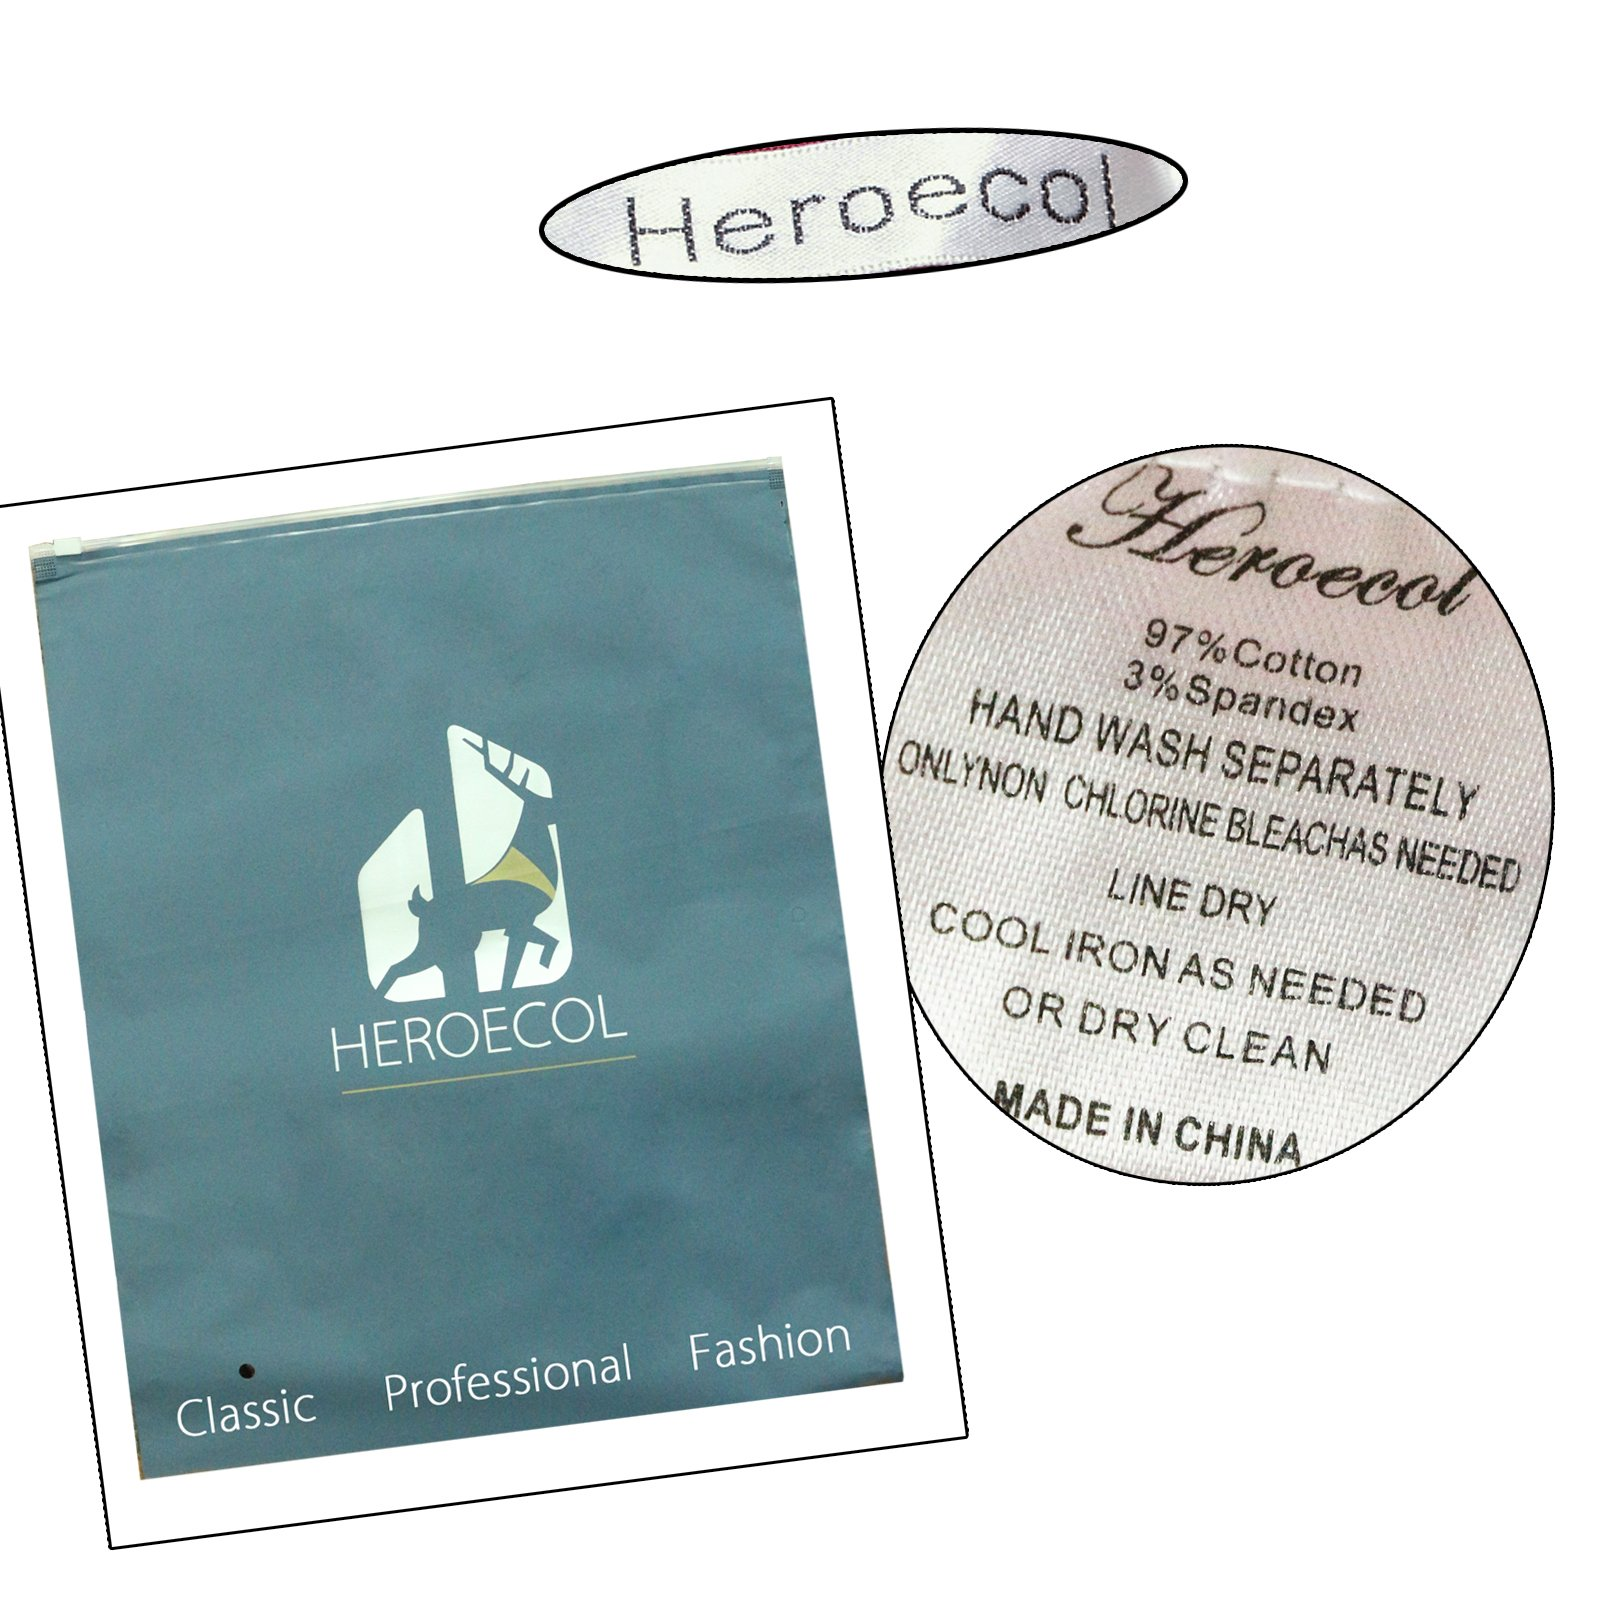 Heroecol 50s 60s Hepburn 3/4 Sleeve Style Vintage Retro Swing Rockailly Dresses Size XL Color Black by Heroecol (Image #6)